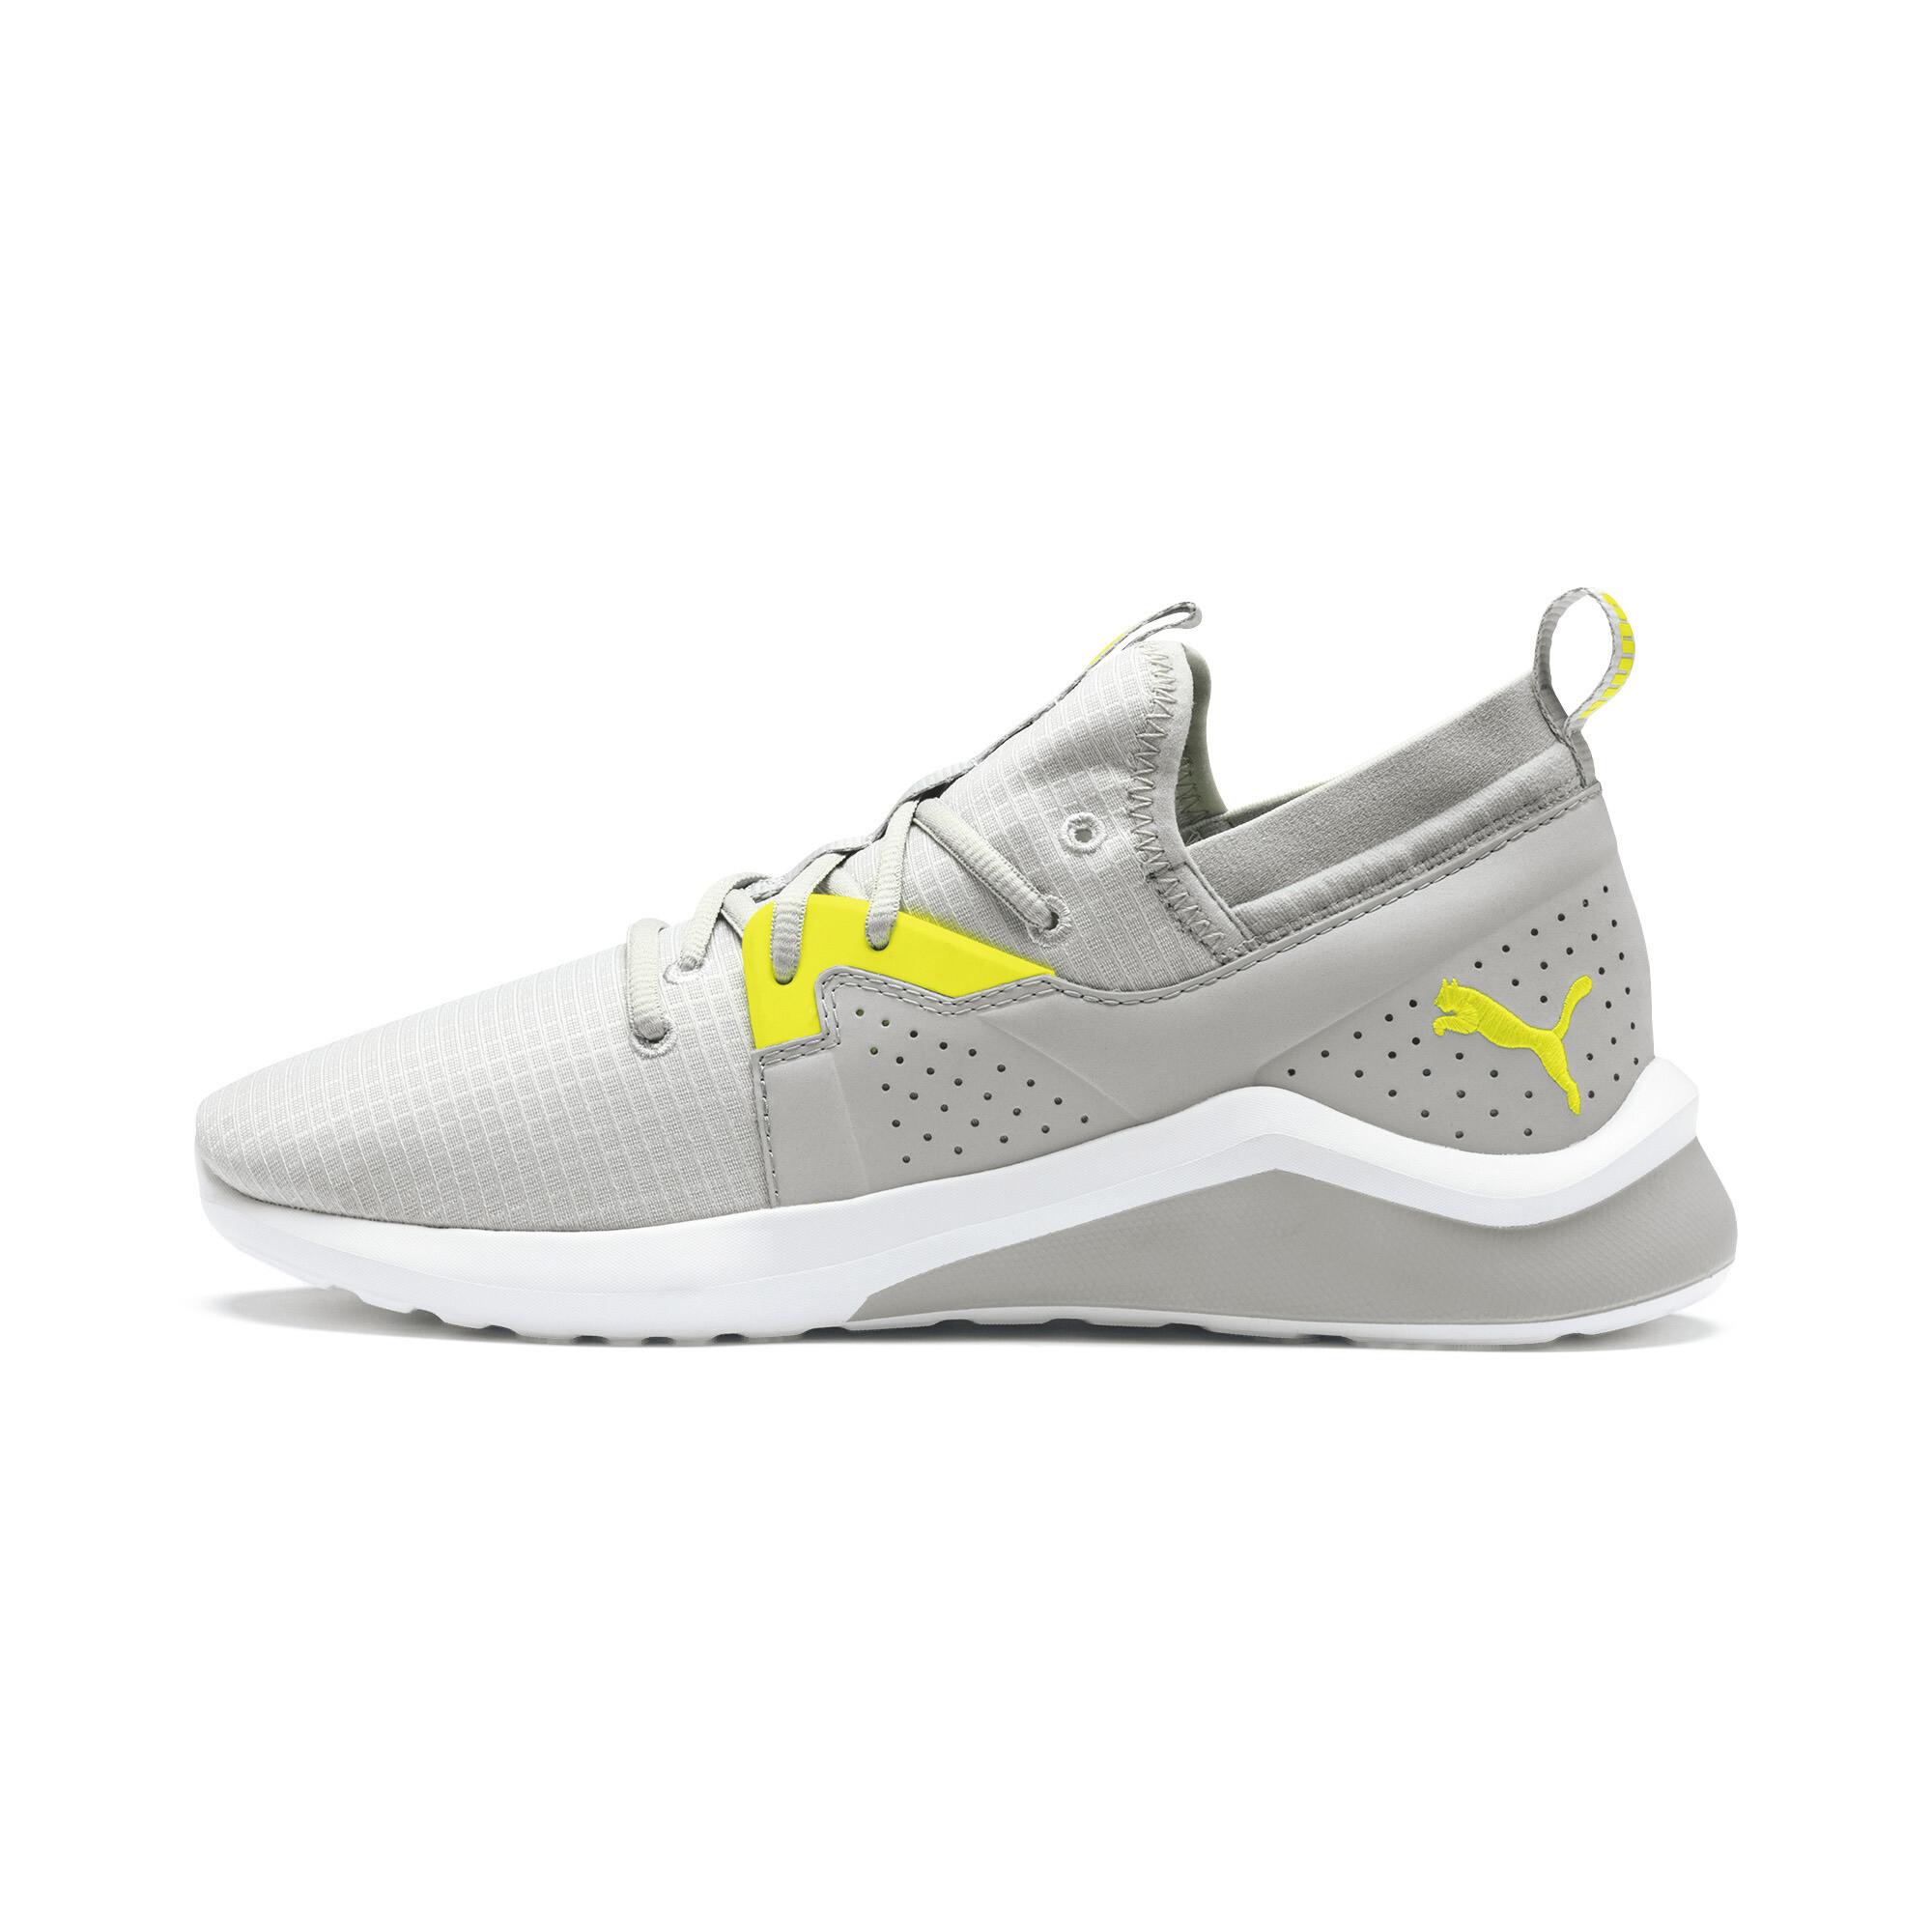 PUMA-Men-039-s-Emergence-Lights-Training-Shoes thumbnail 4